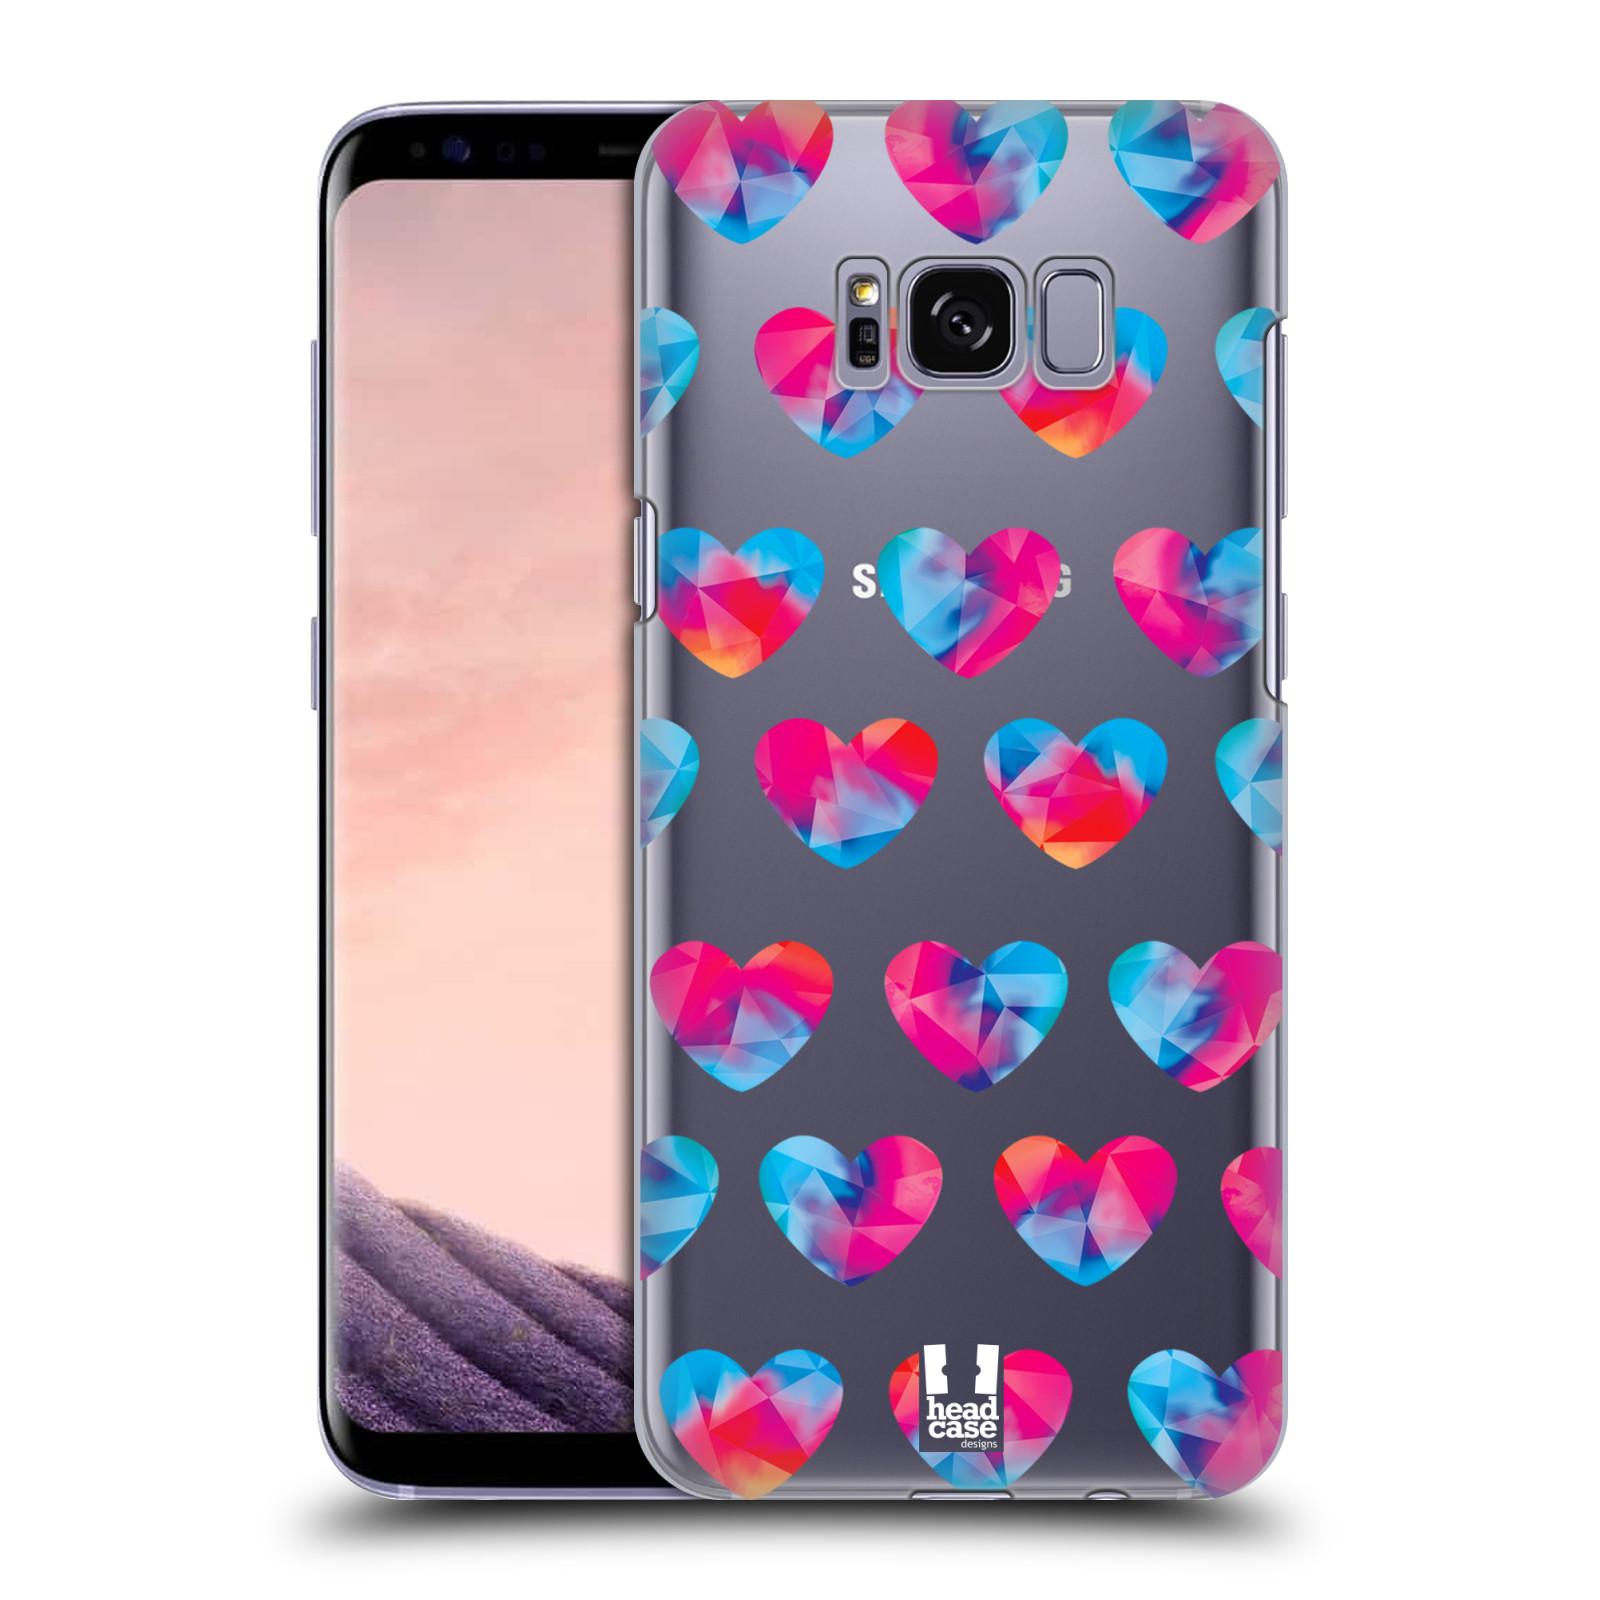 Plastové pouzdro na mobil Samsung Galaxy S8 - Head Case - Srdíčka hrající barvami